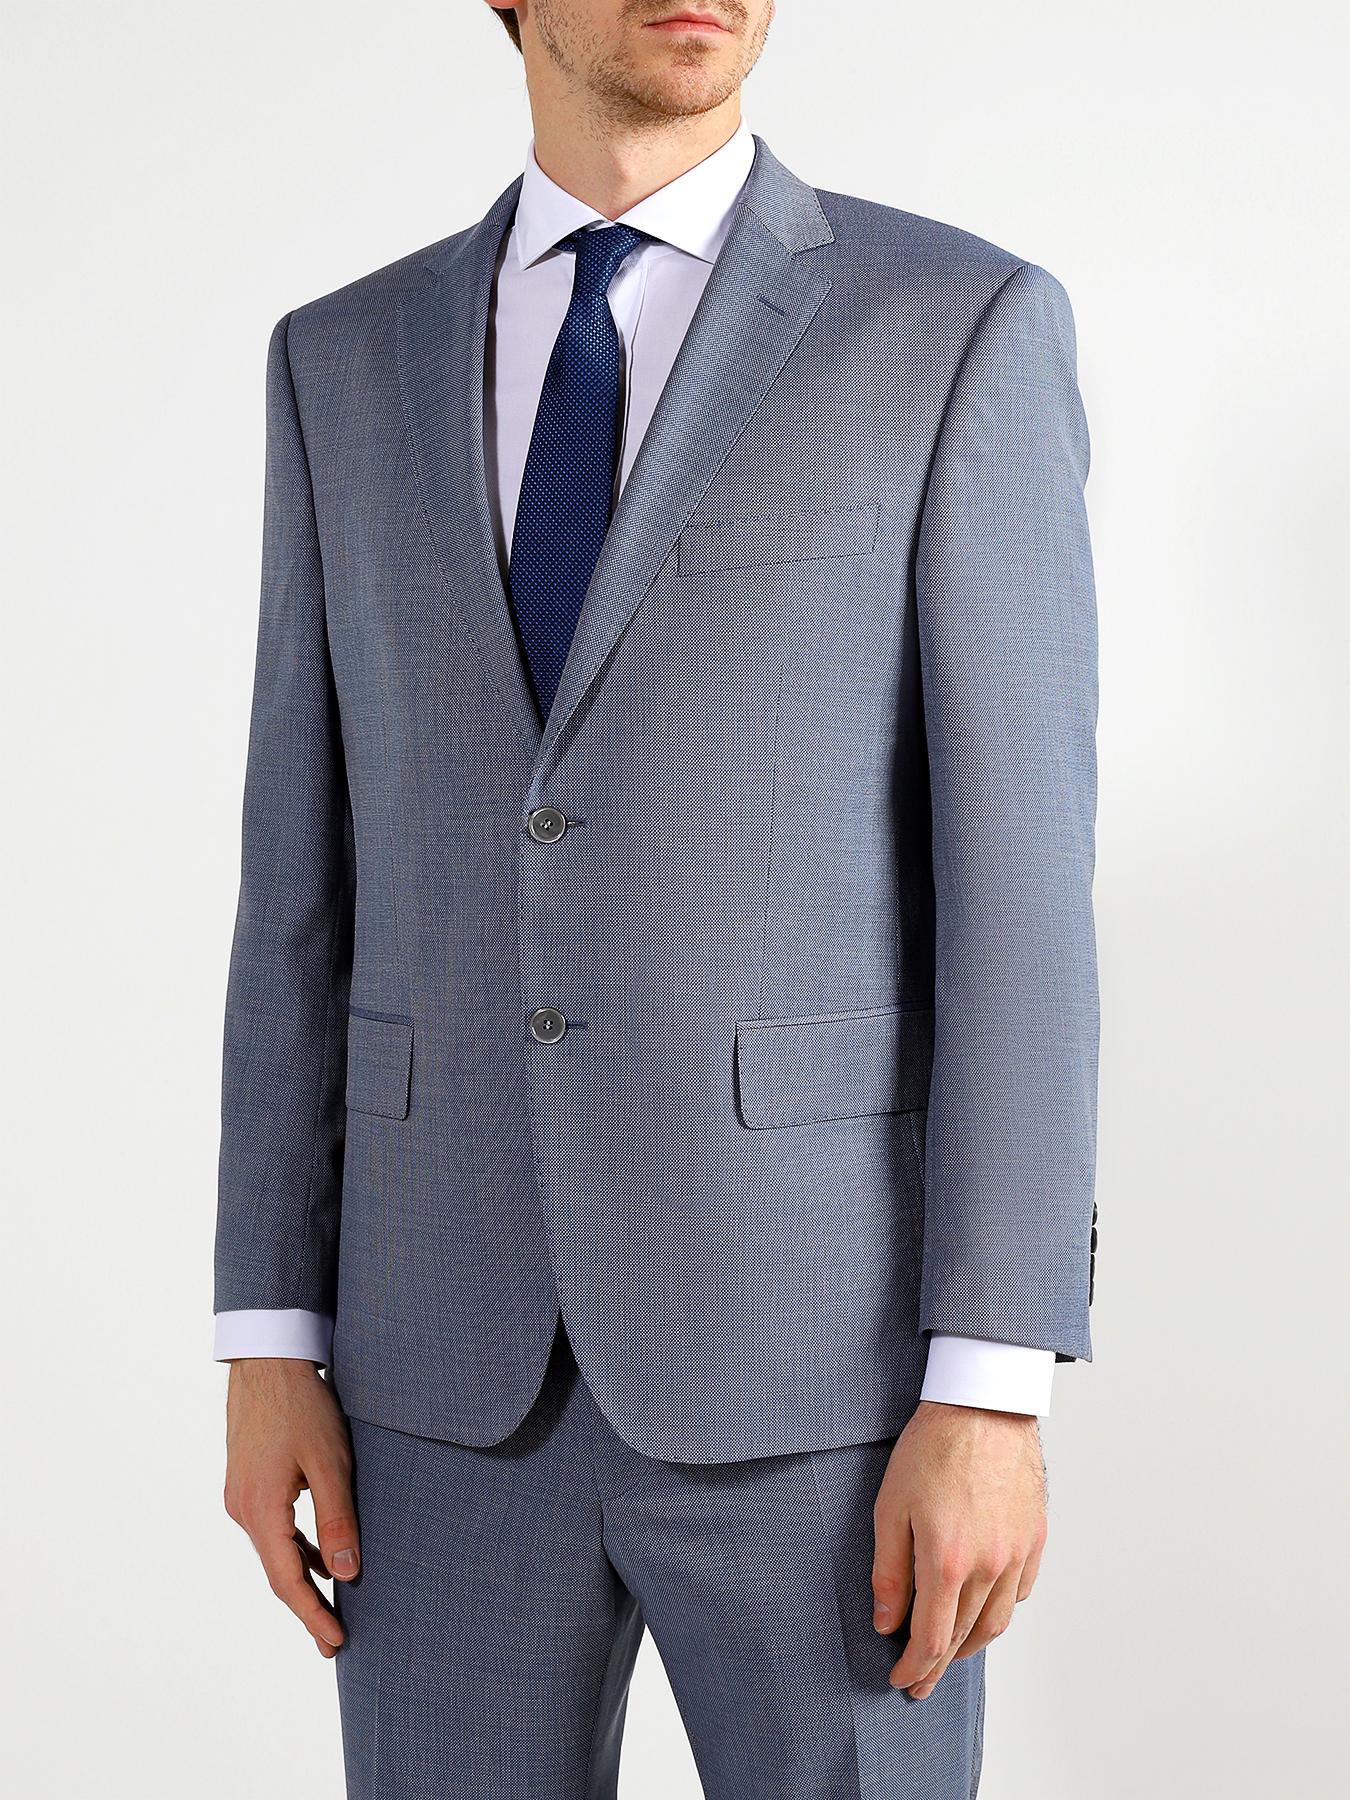 Ritter Классический костюм из шерсти фото